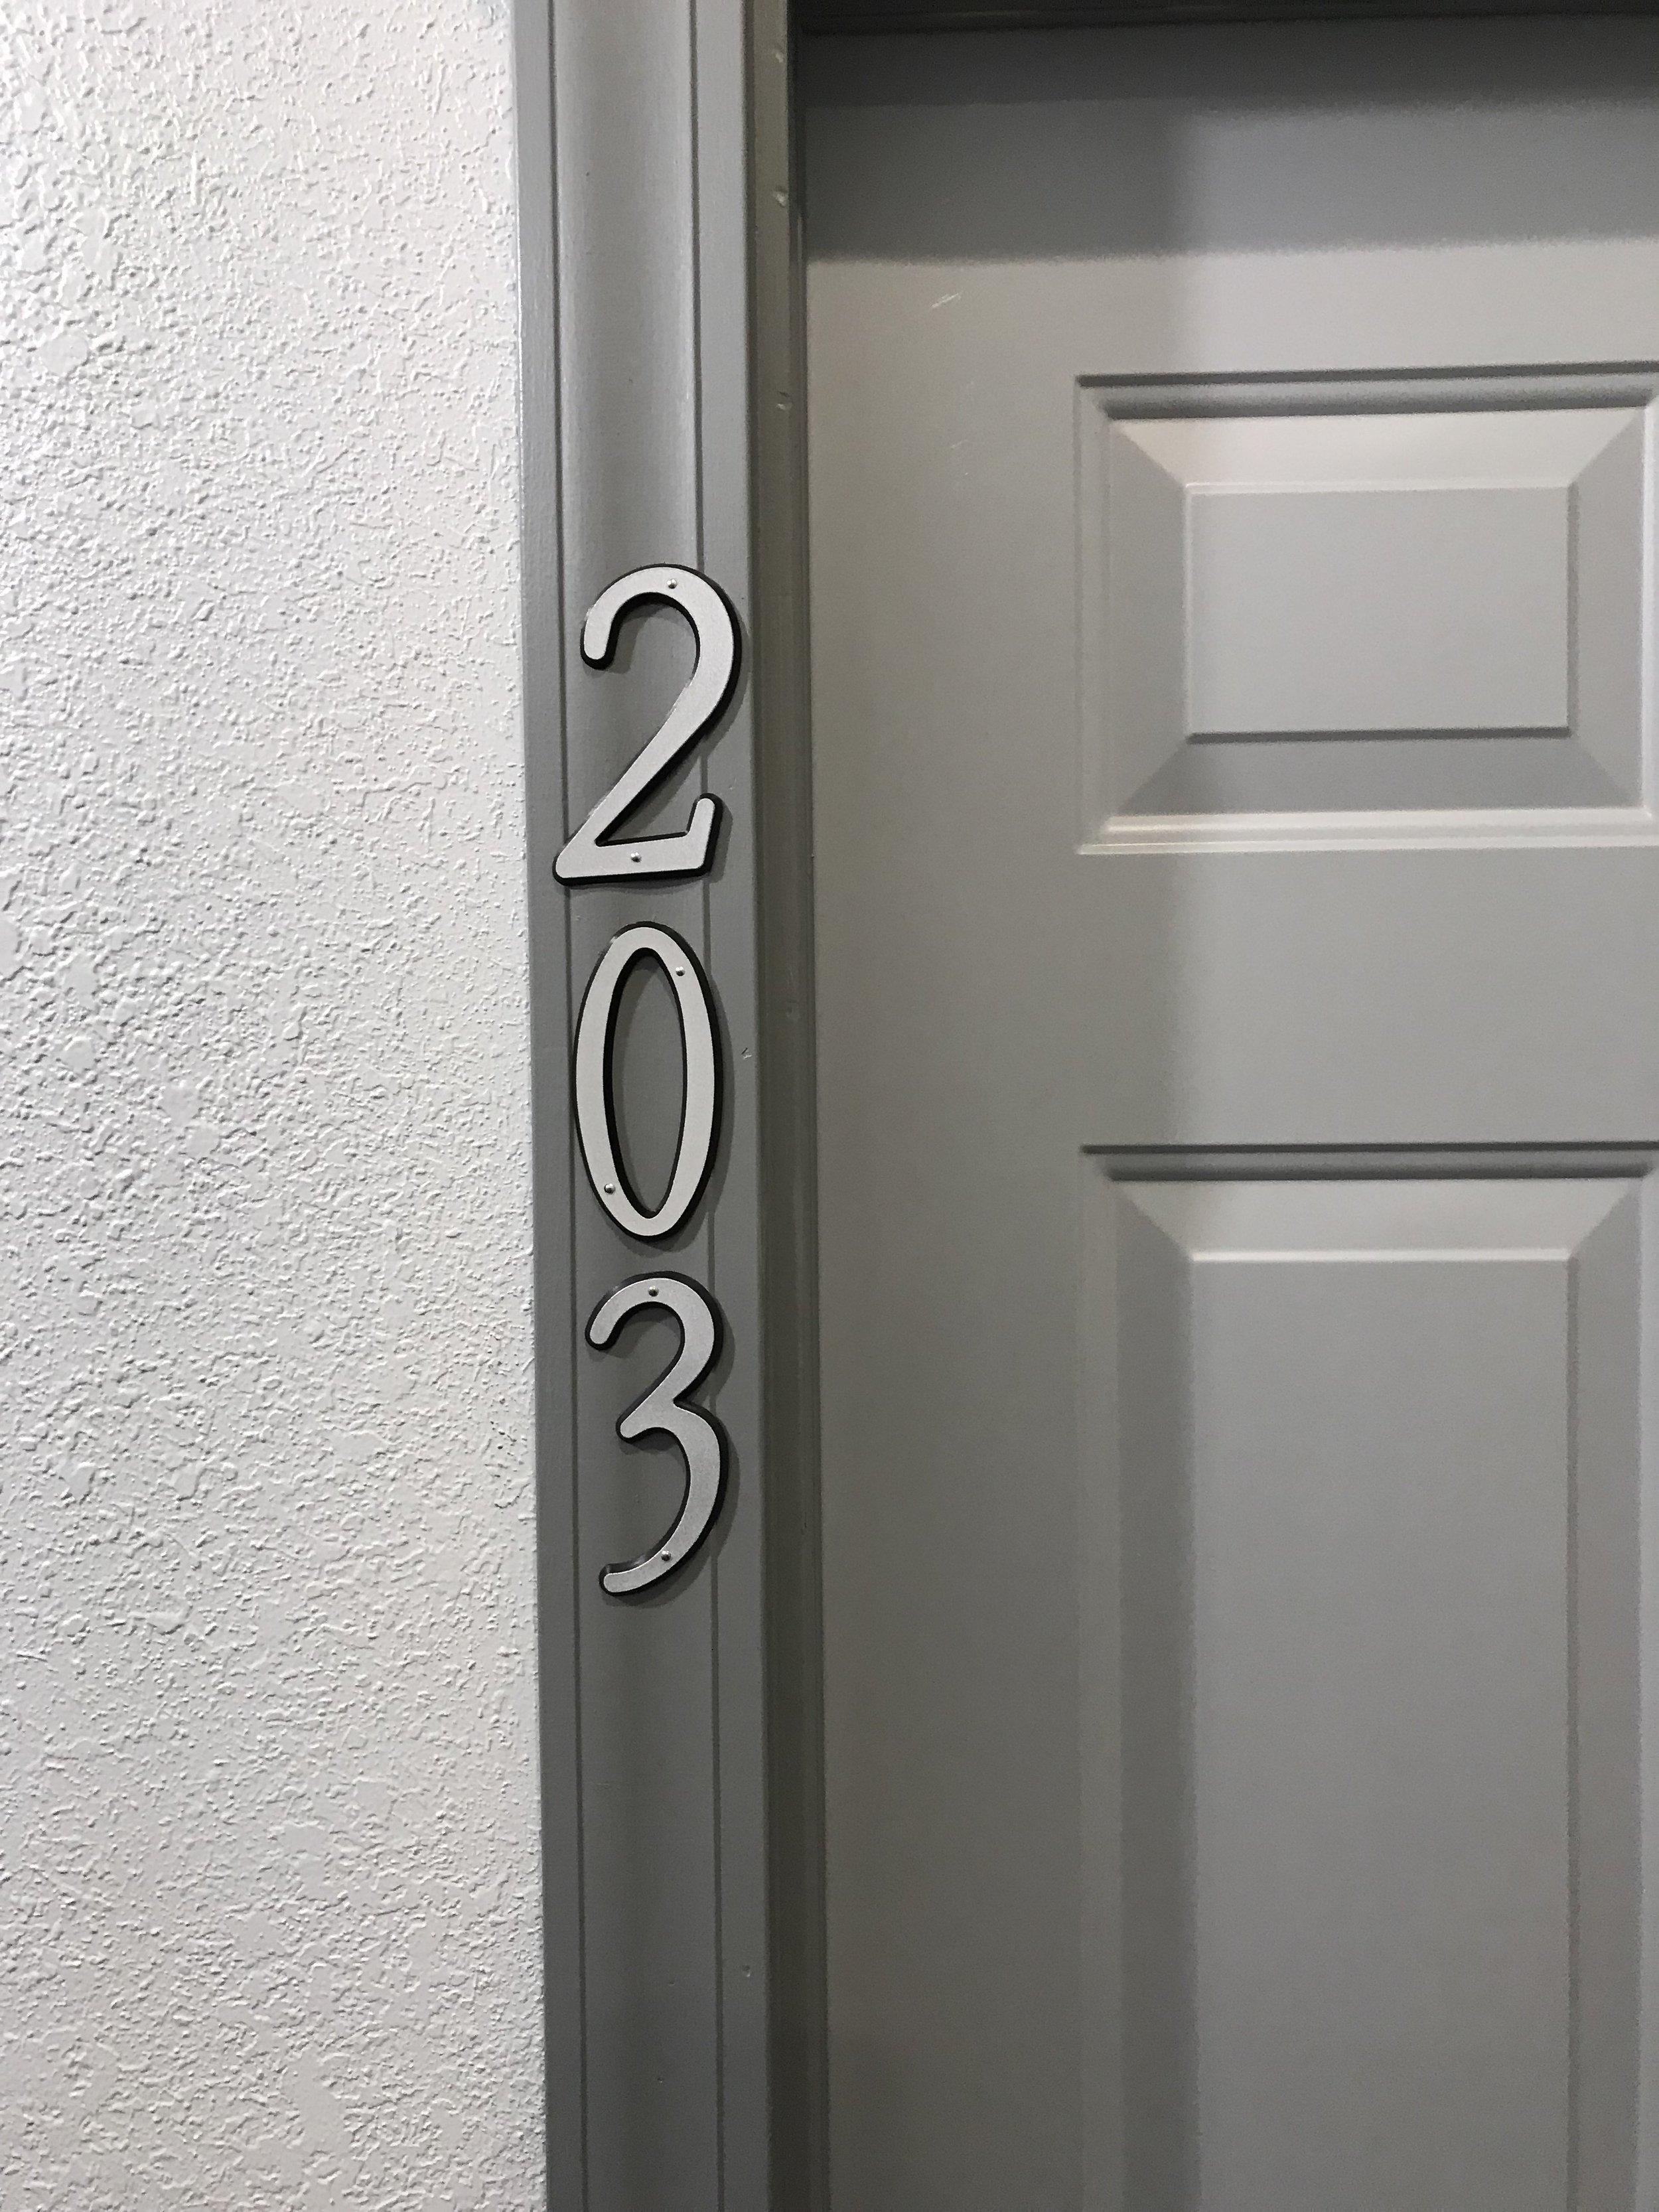 Apartment 203 - 1 Bedroom